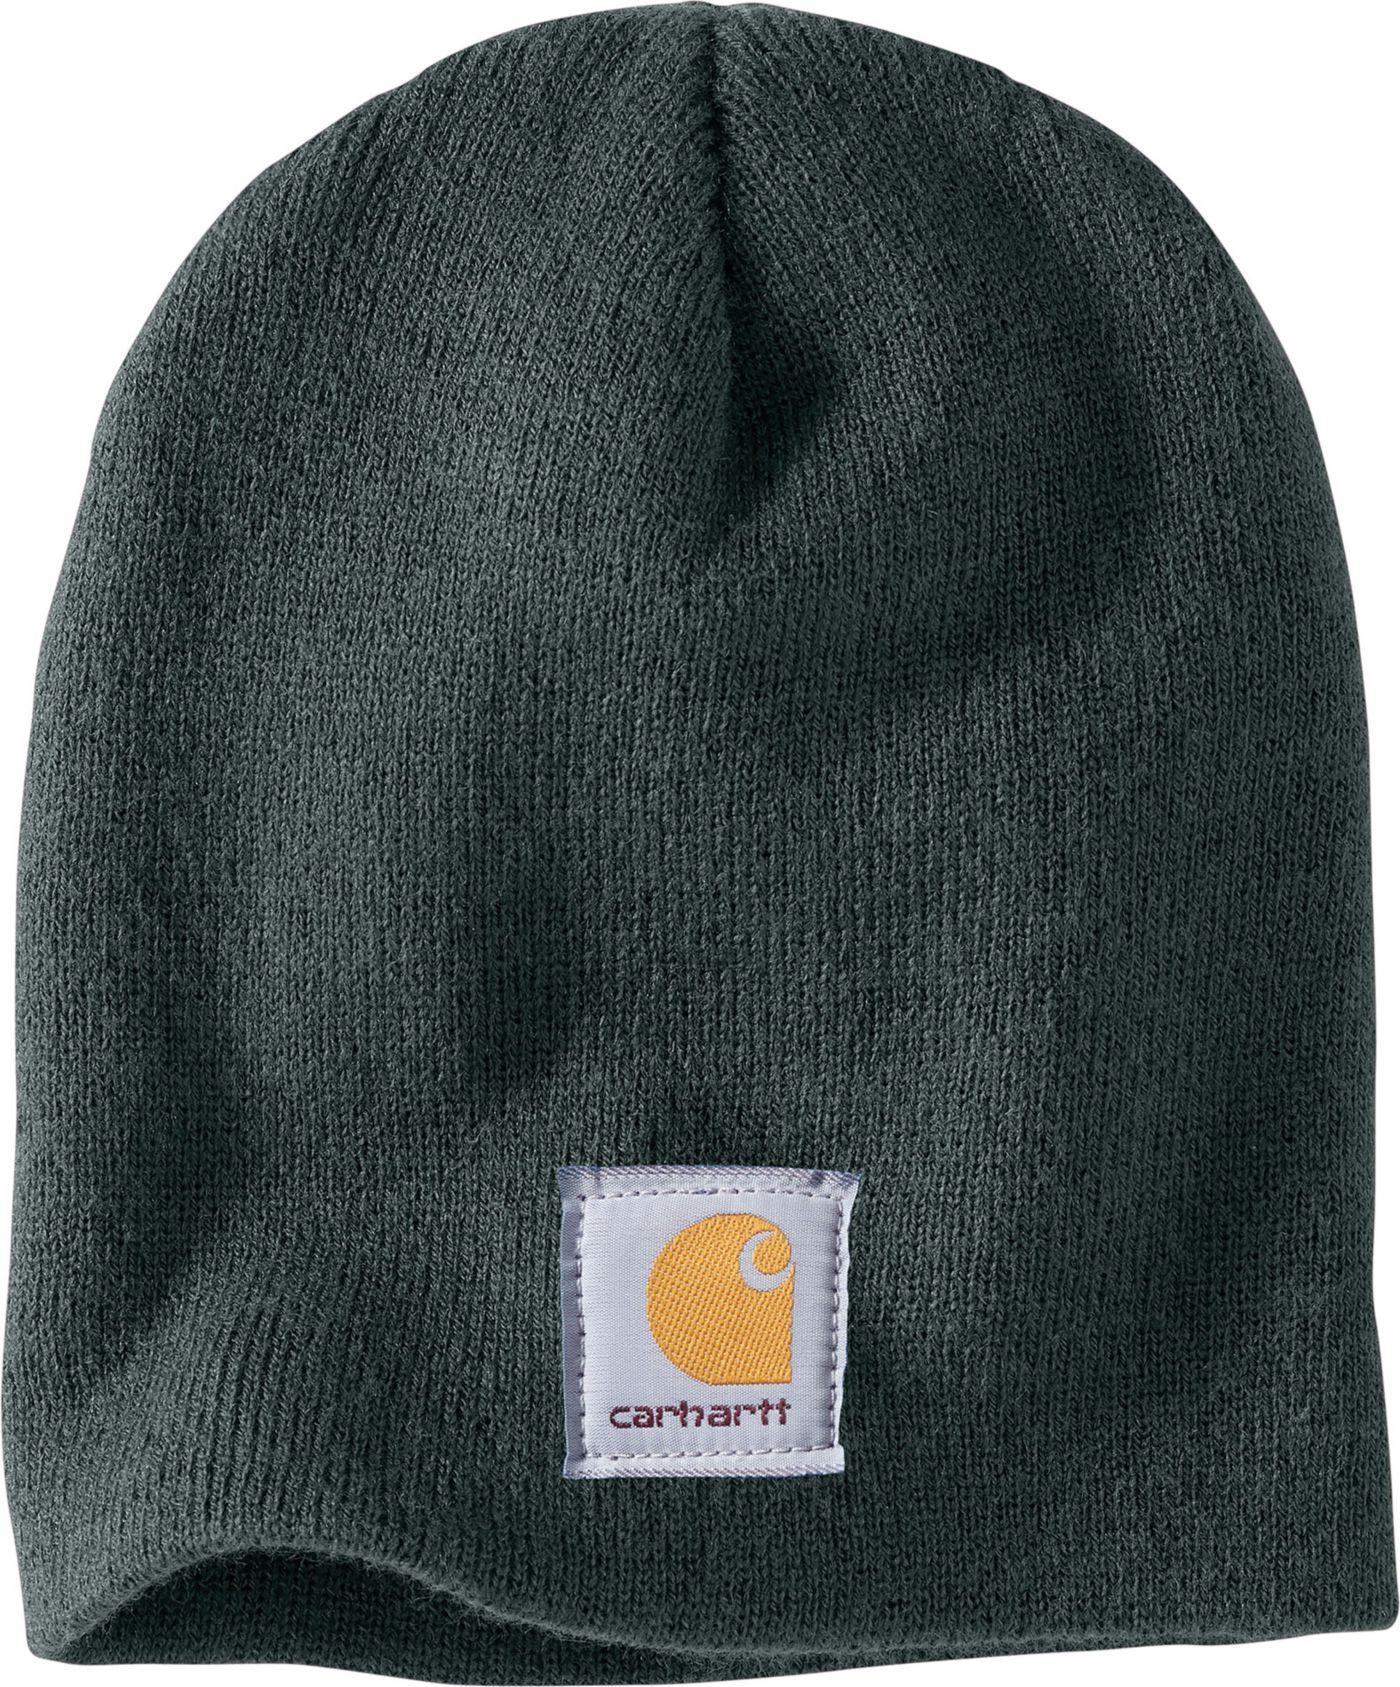 Carhartt Women's Acrylic Knit Beanie